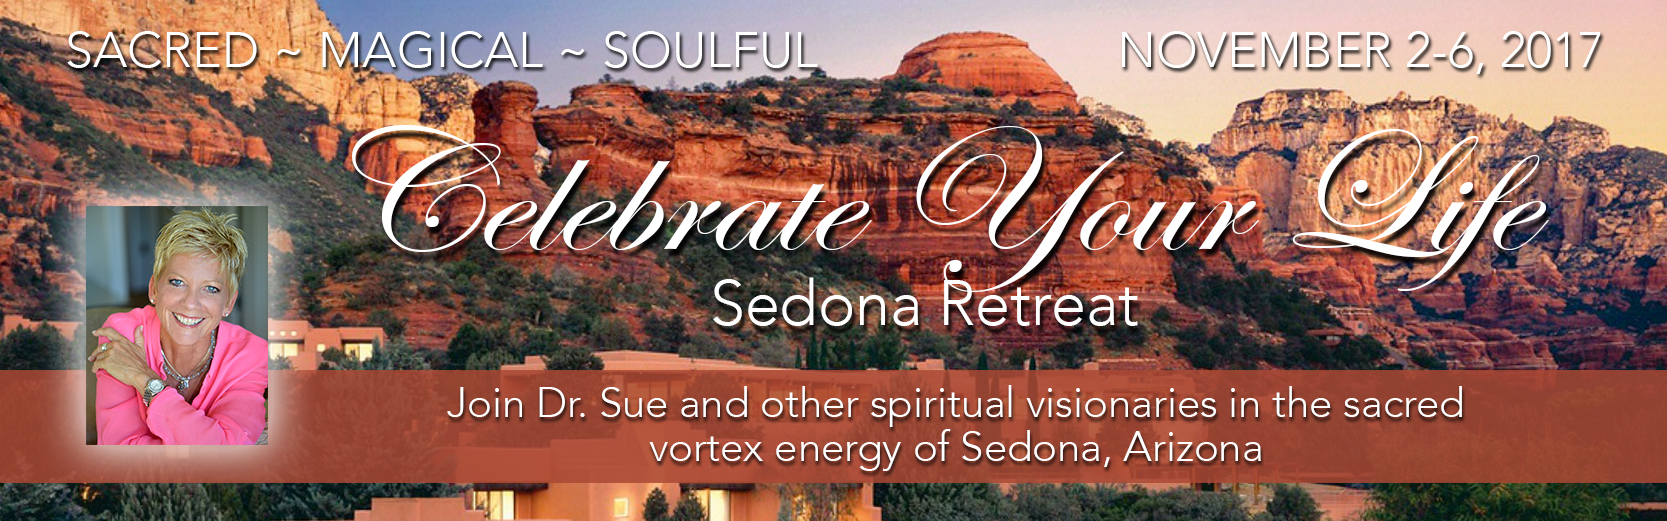 Celebrate Your Life Sedona November 2-6 2017